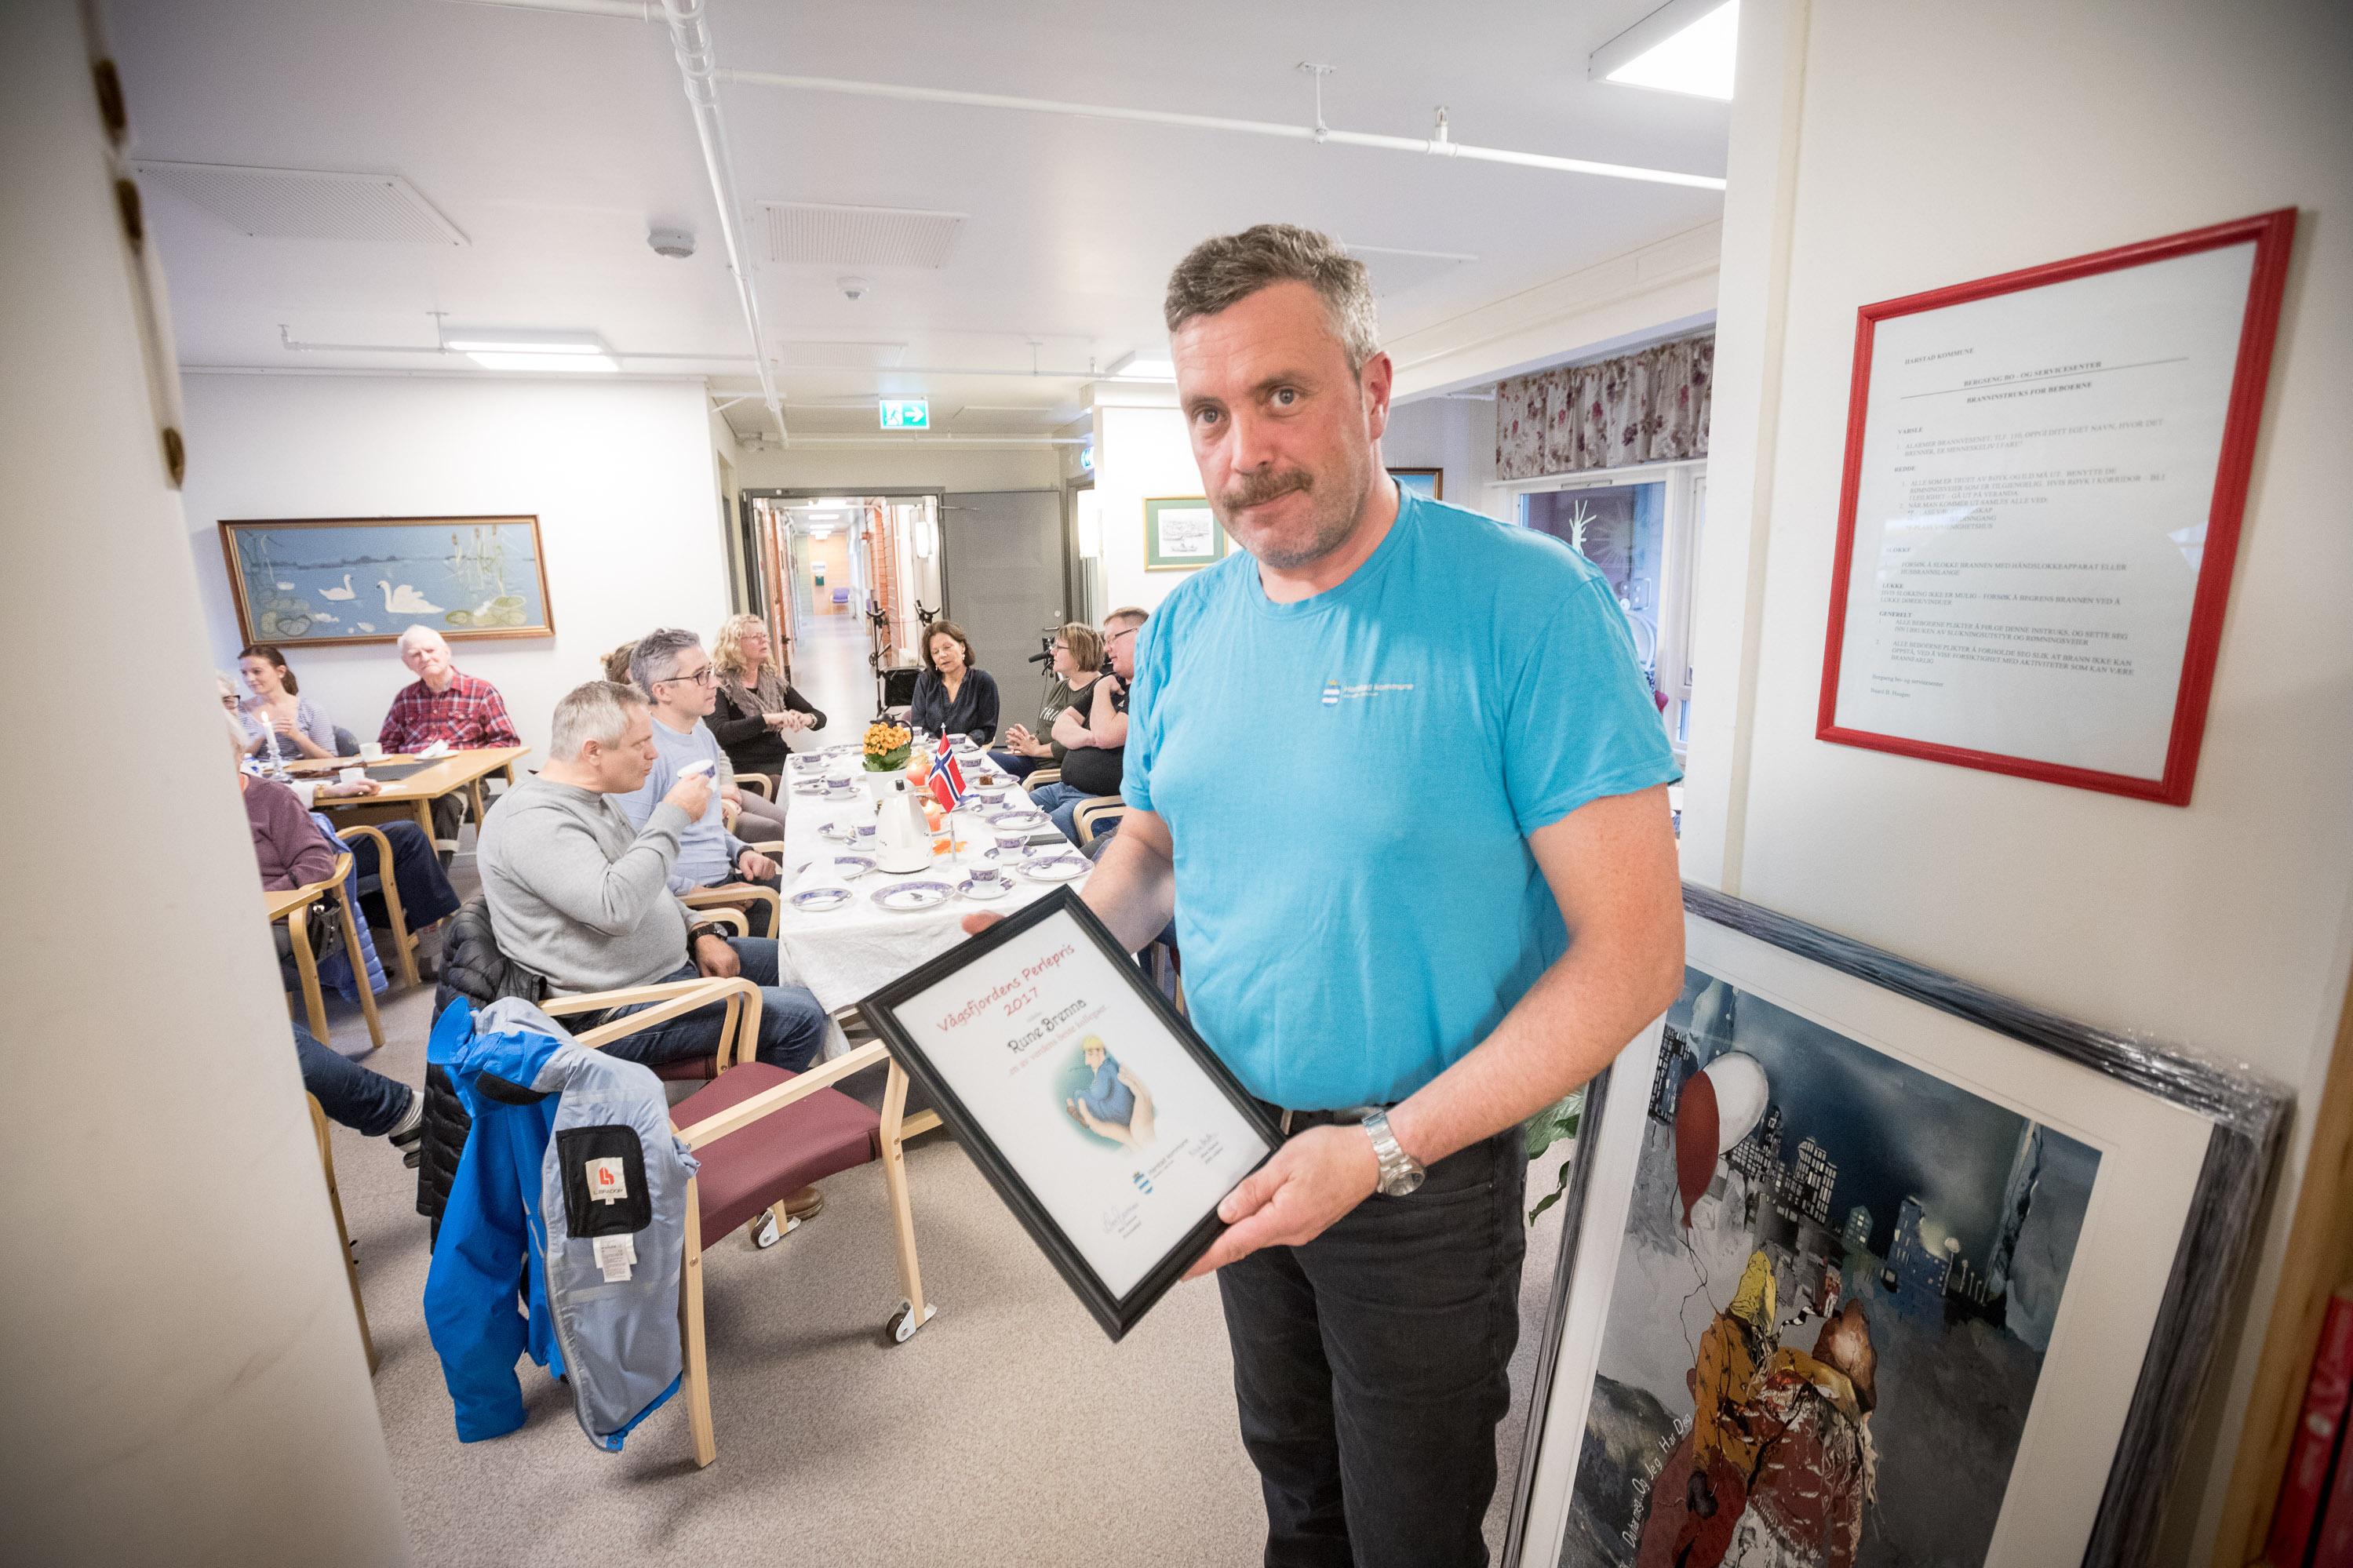 Vaagsfjordens perlepris ble delt ut til Rune Brenna. Foto: Øivind Arvola